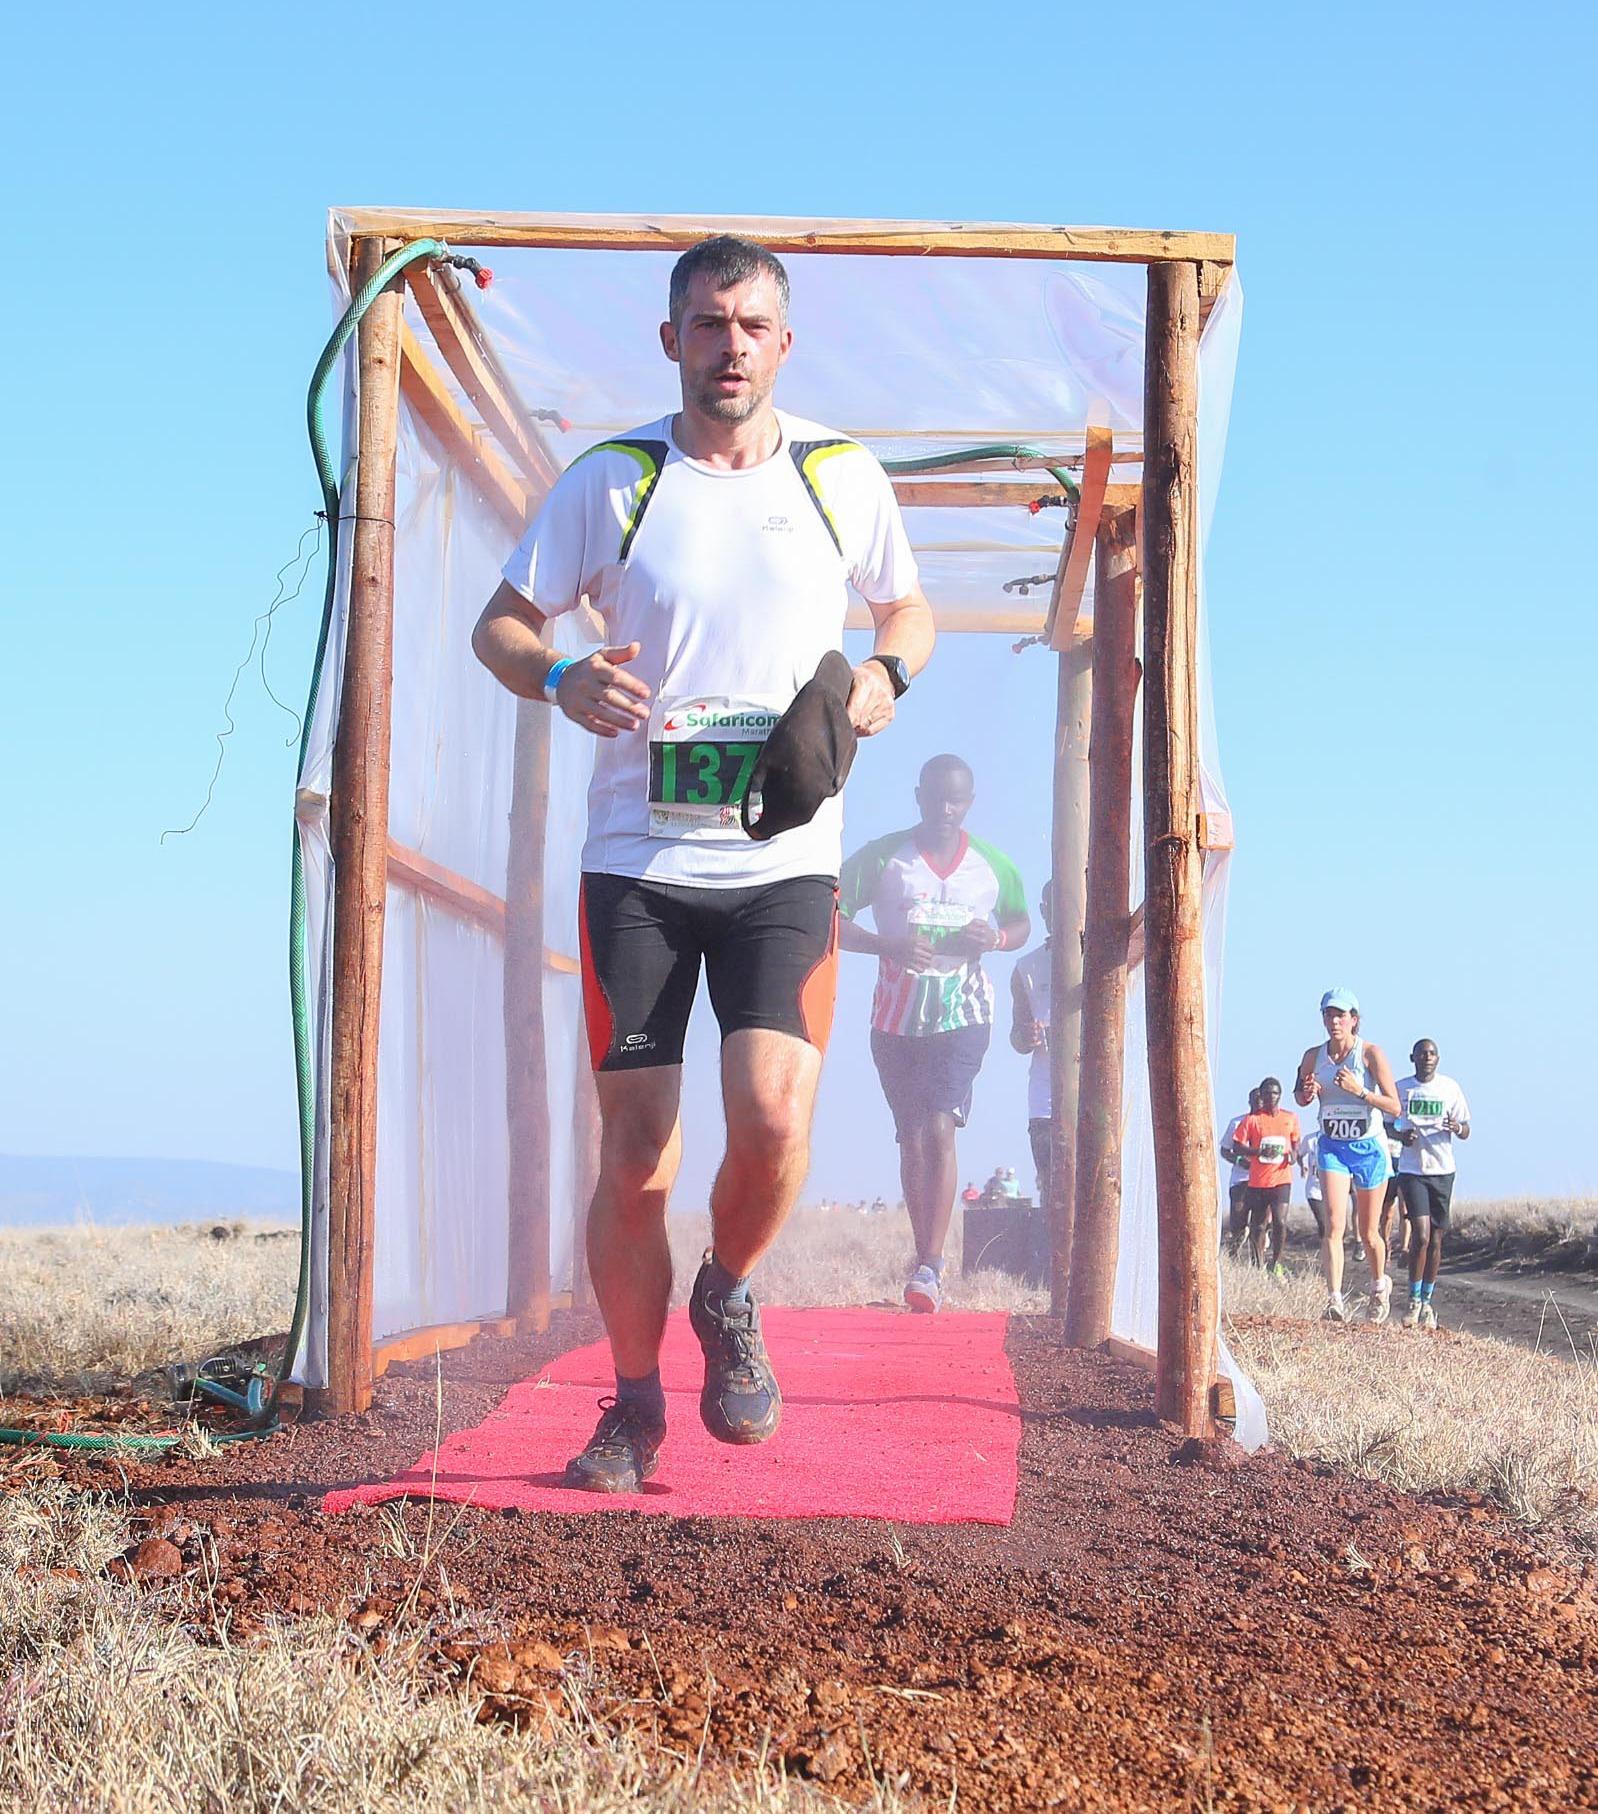 Thibaud running in the wild during the 2017 Safaricom Marathon in Lewa.